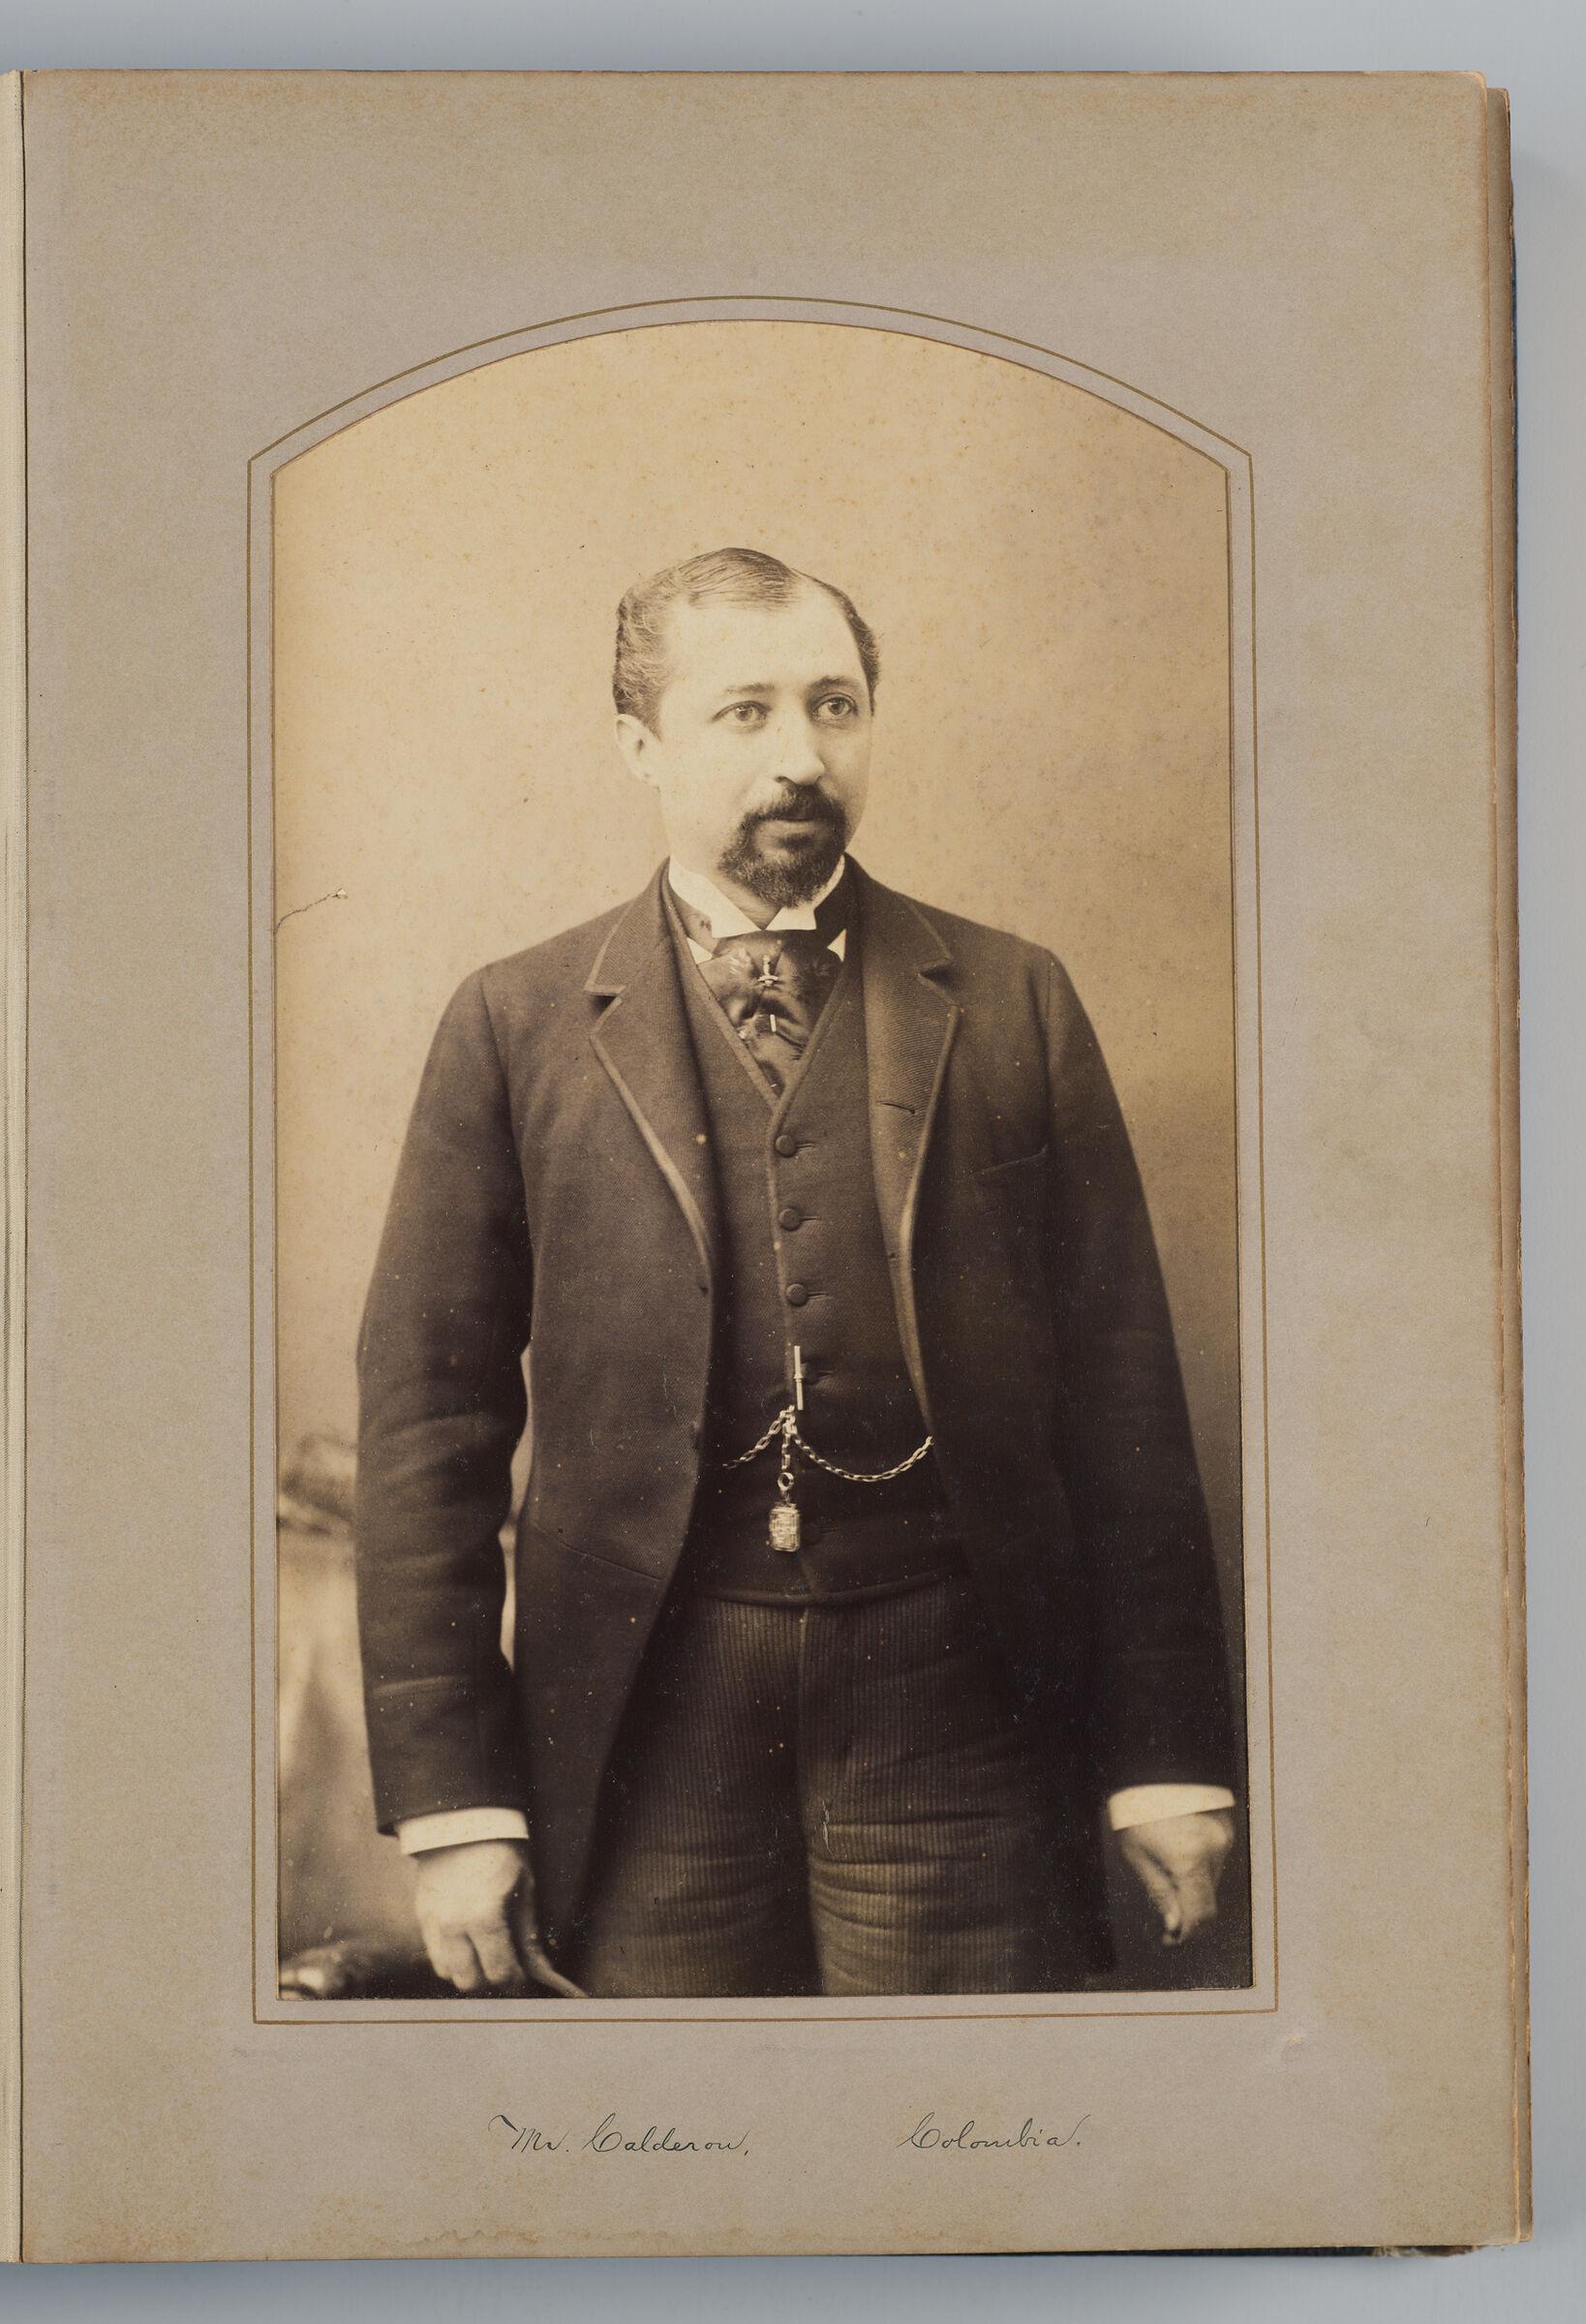 Clinaco Calderón (Columbian Delegate)